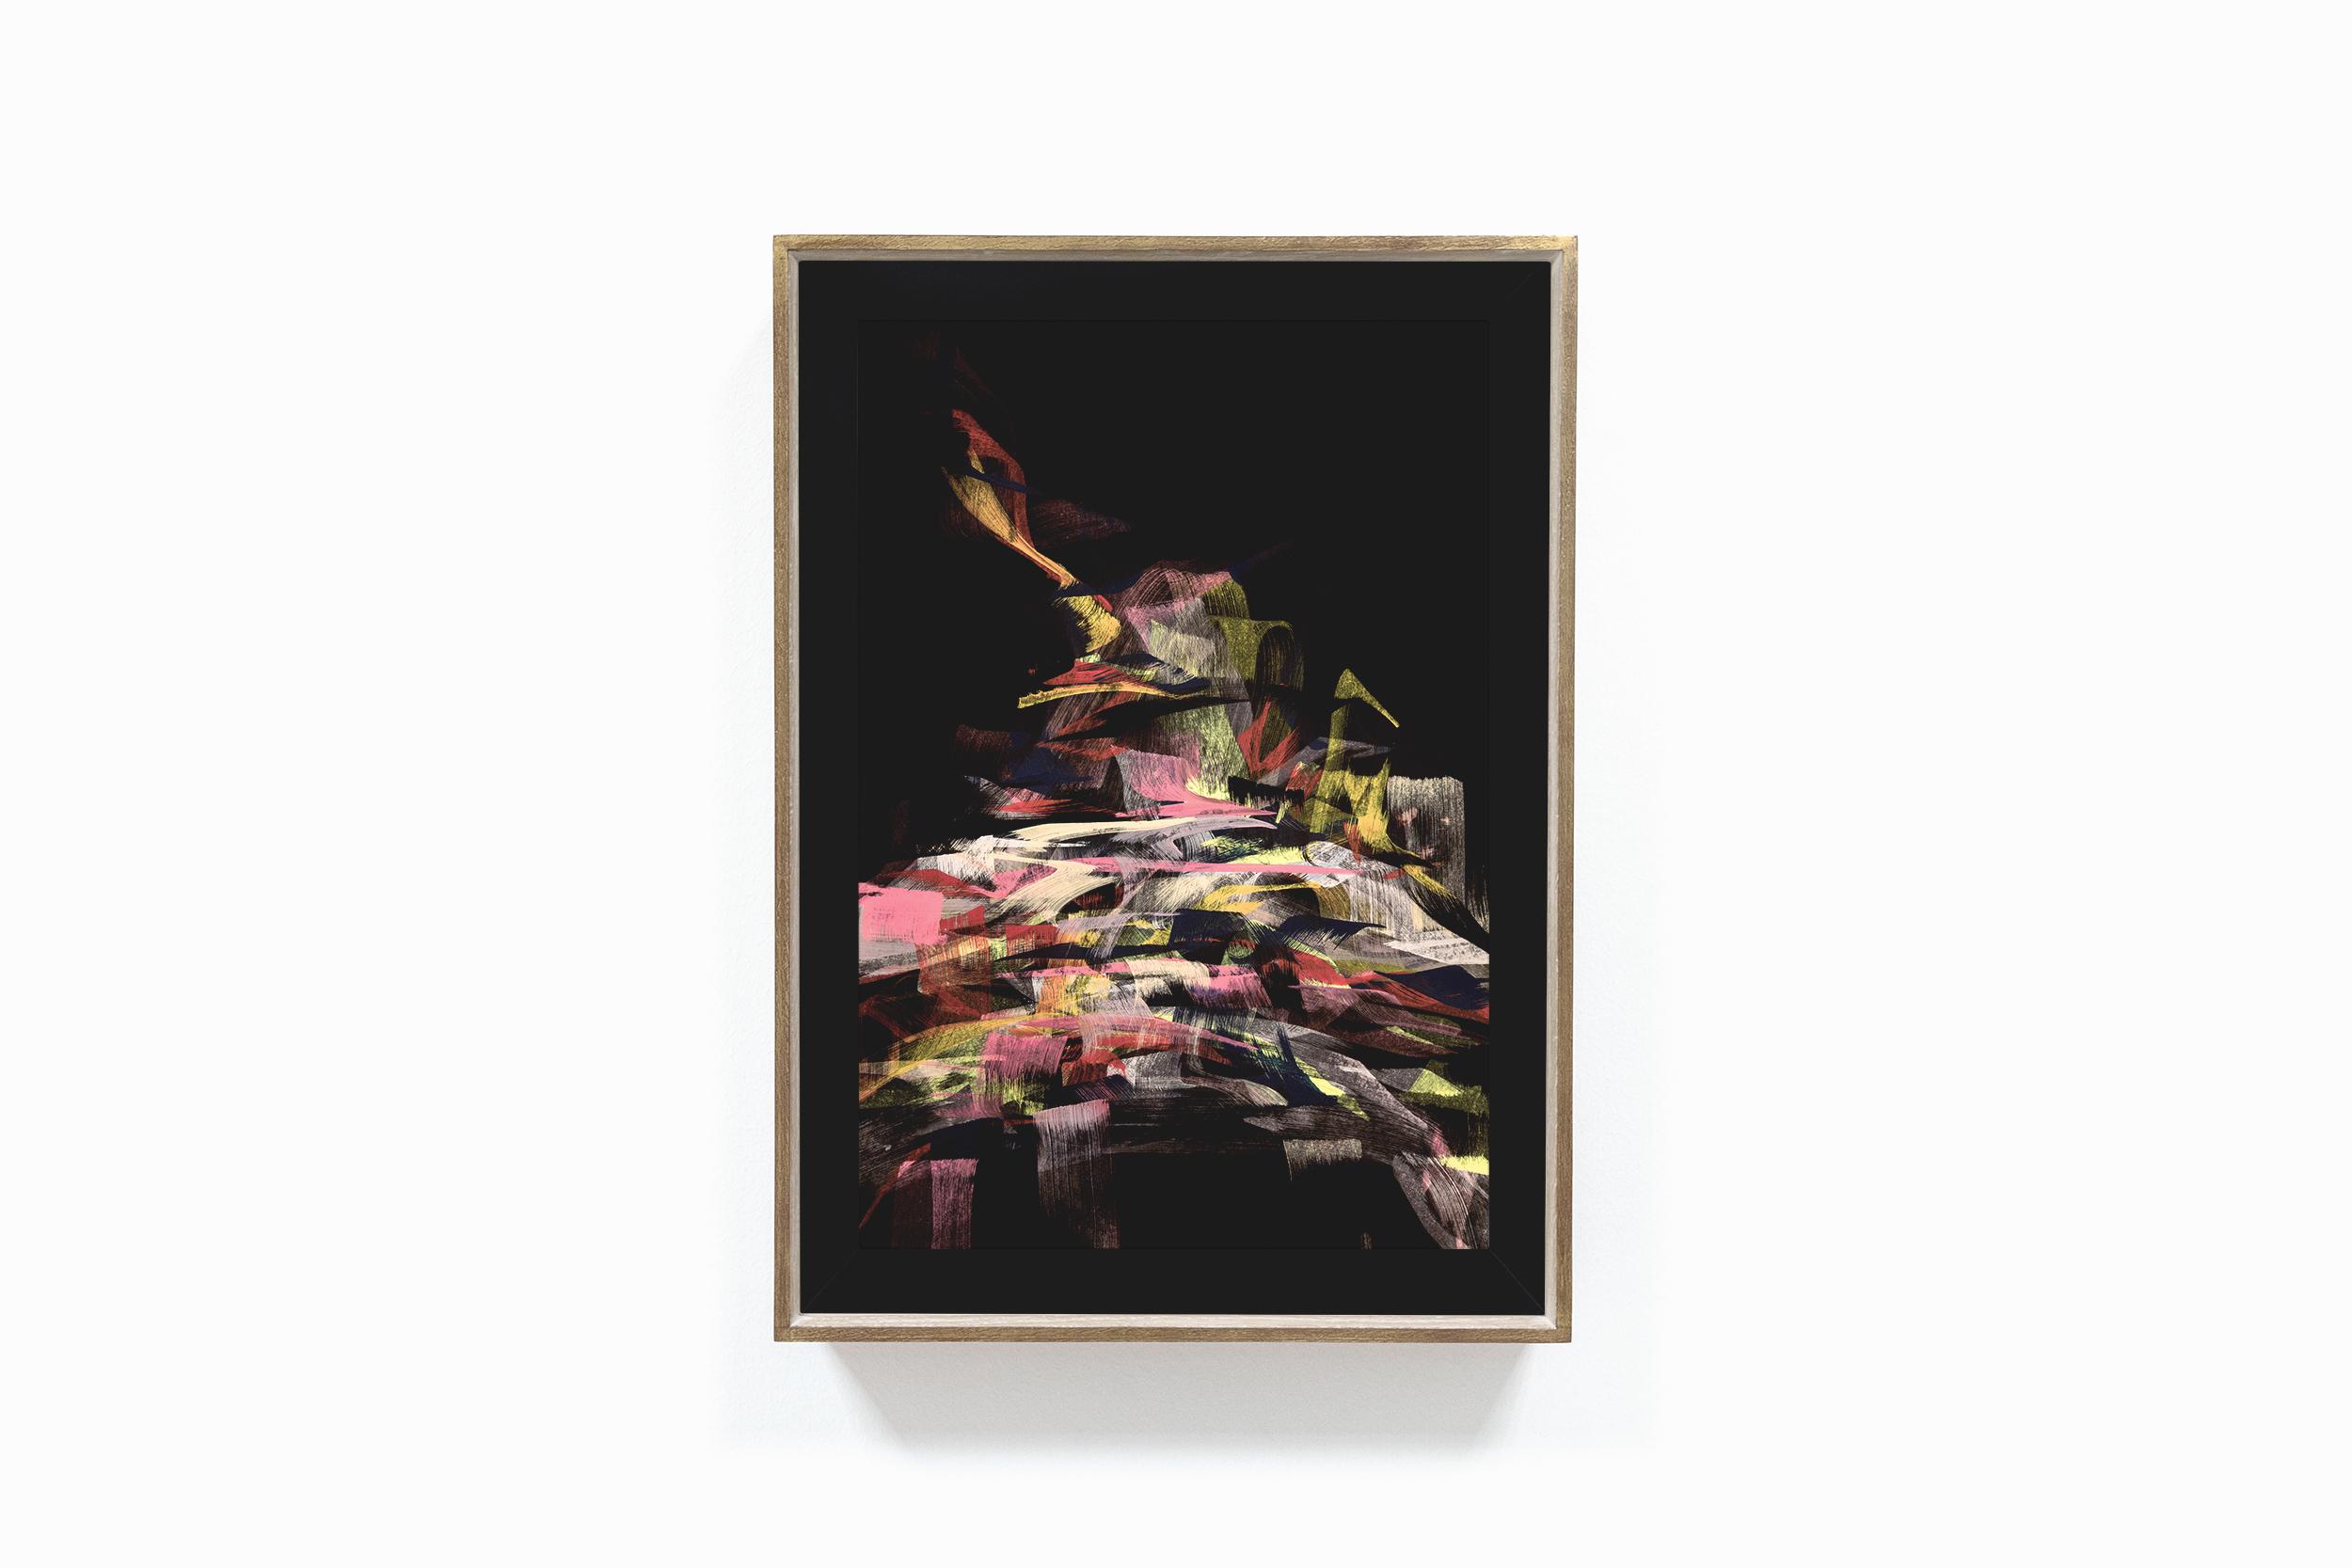 bonjourmolotov Deambulaia Illustration Ilustracao painting pintura acrylic acrílico canvas tela paper cardboard mdf Andre Gigante 16N3.jpg